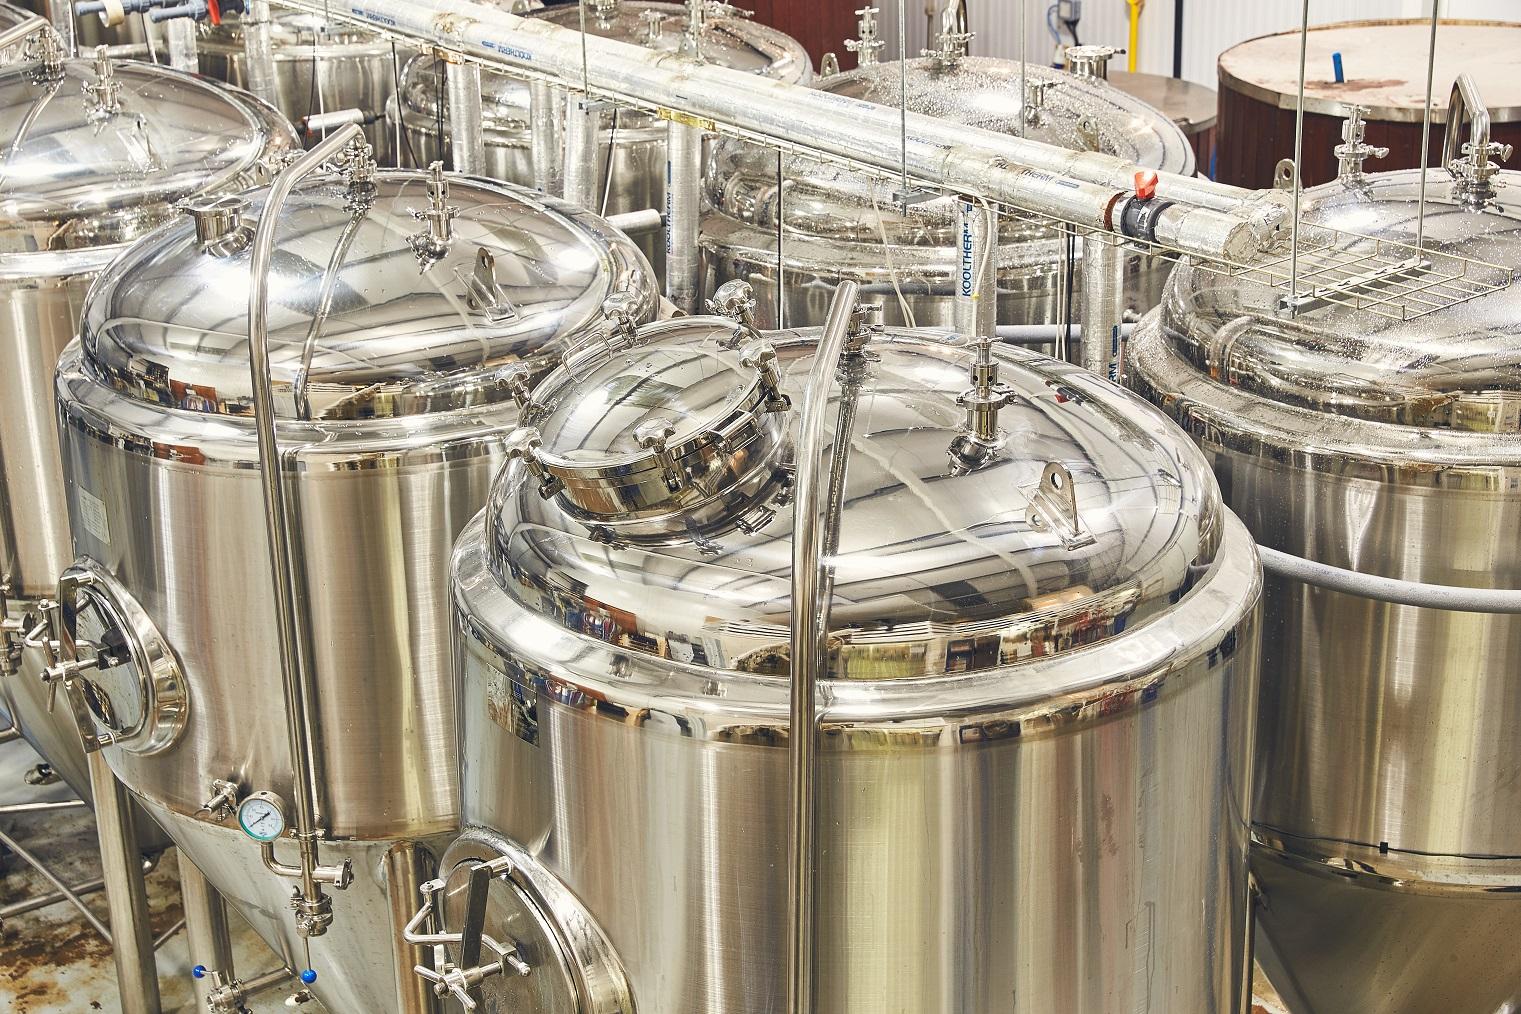 Firebird brewery tanks